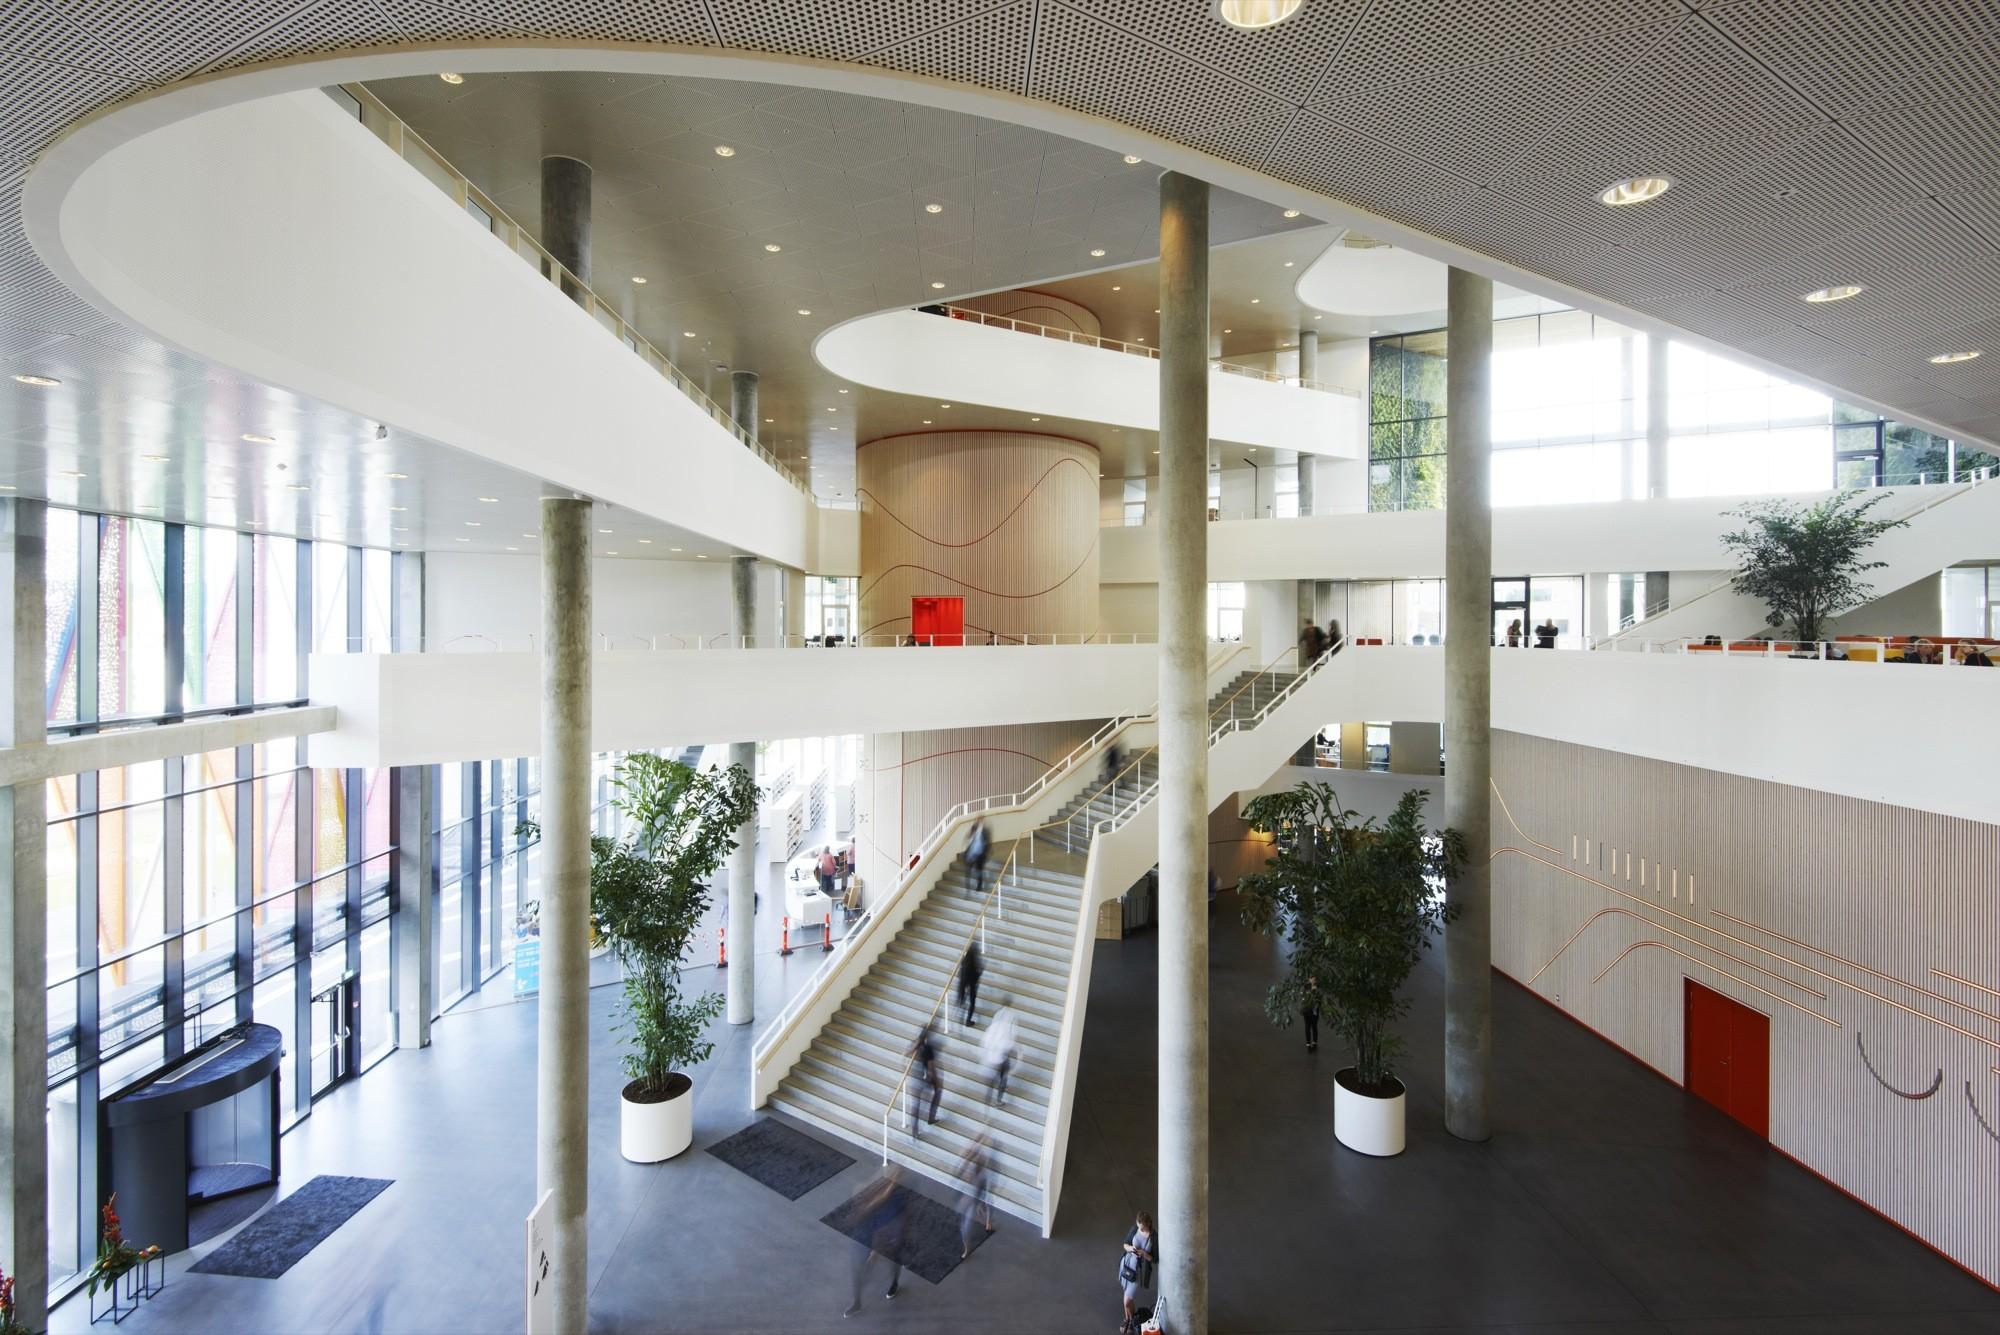 SDU Campus Kolding / Henning Larsen Architects, © Martin Schubert